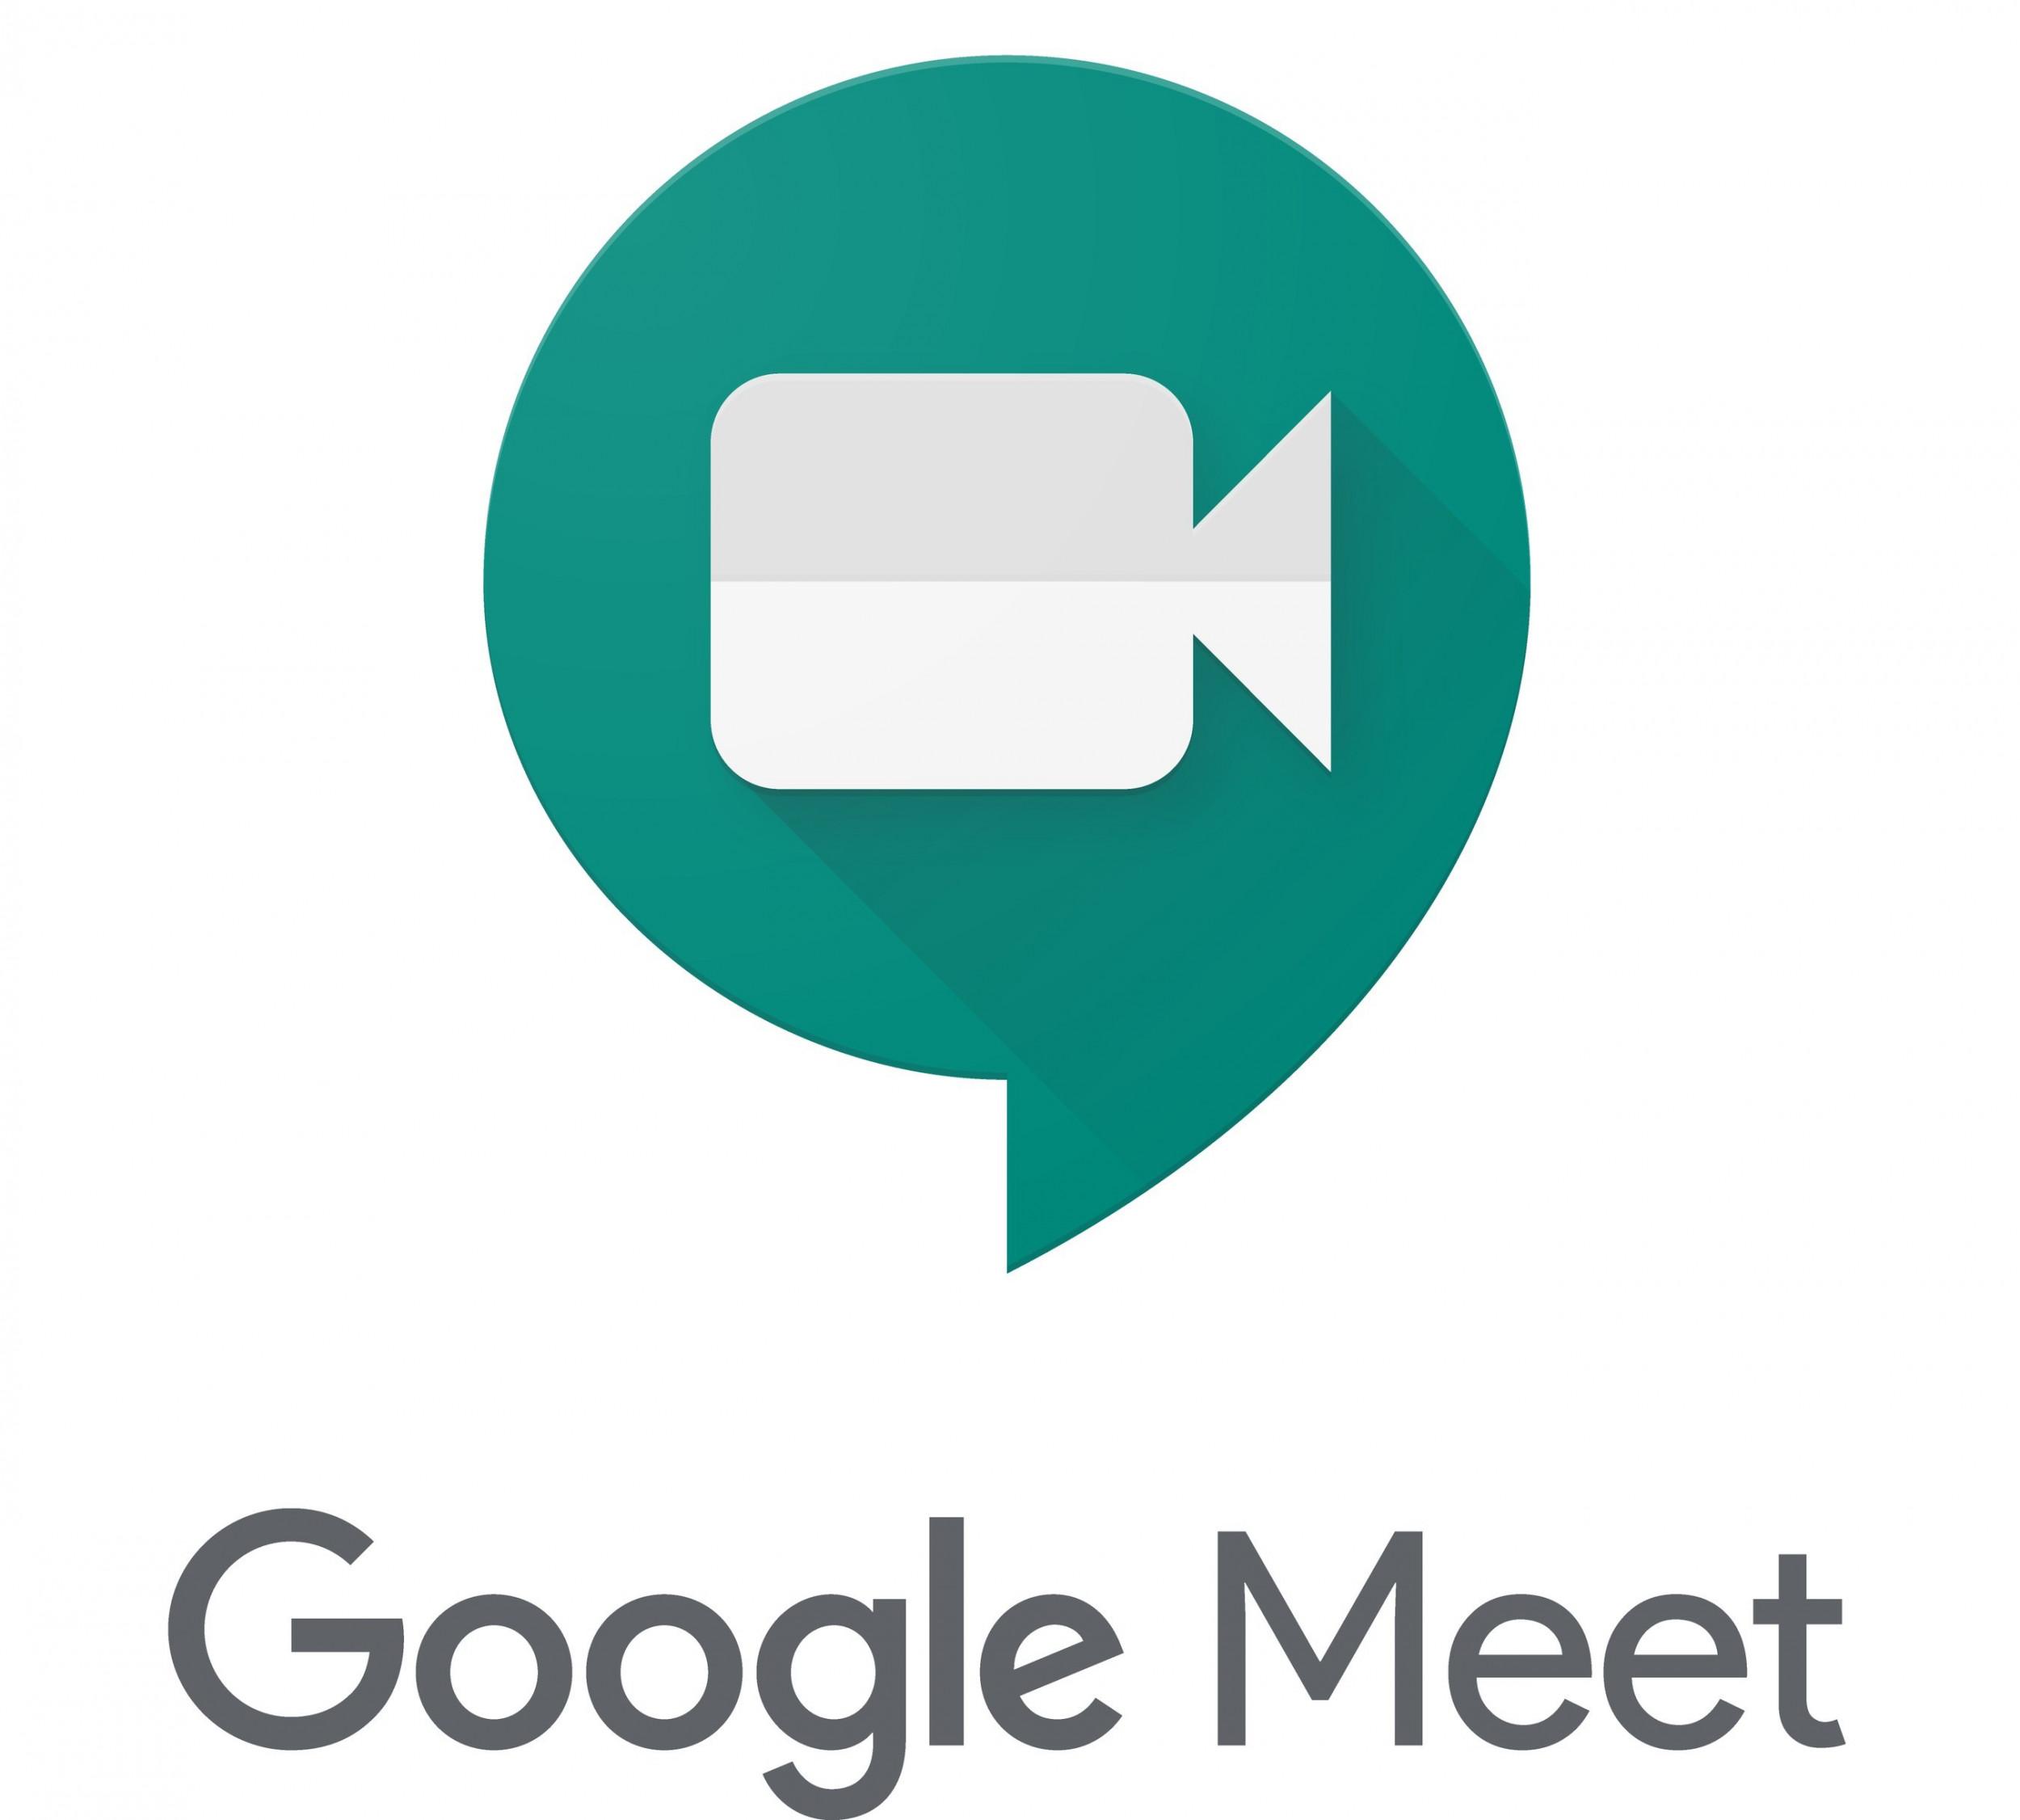 google-meet-logo.jpg